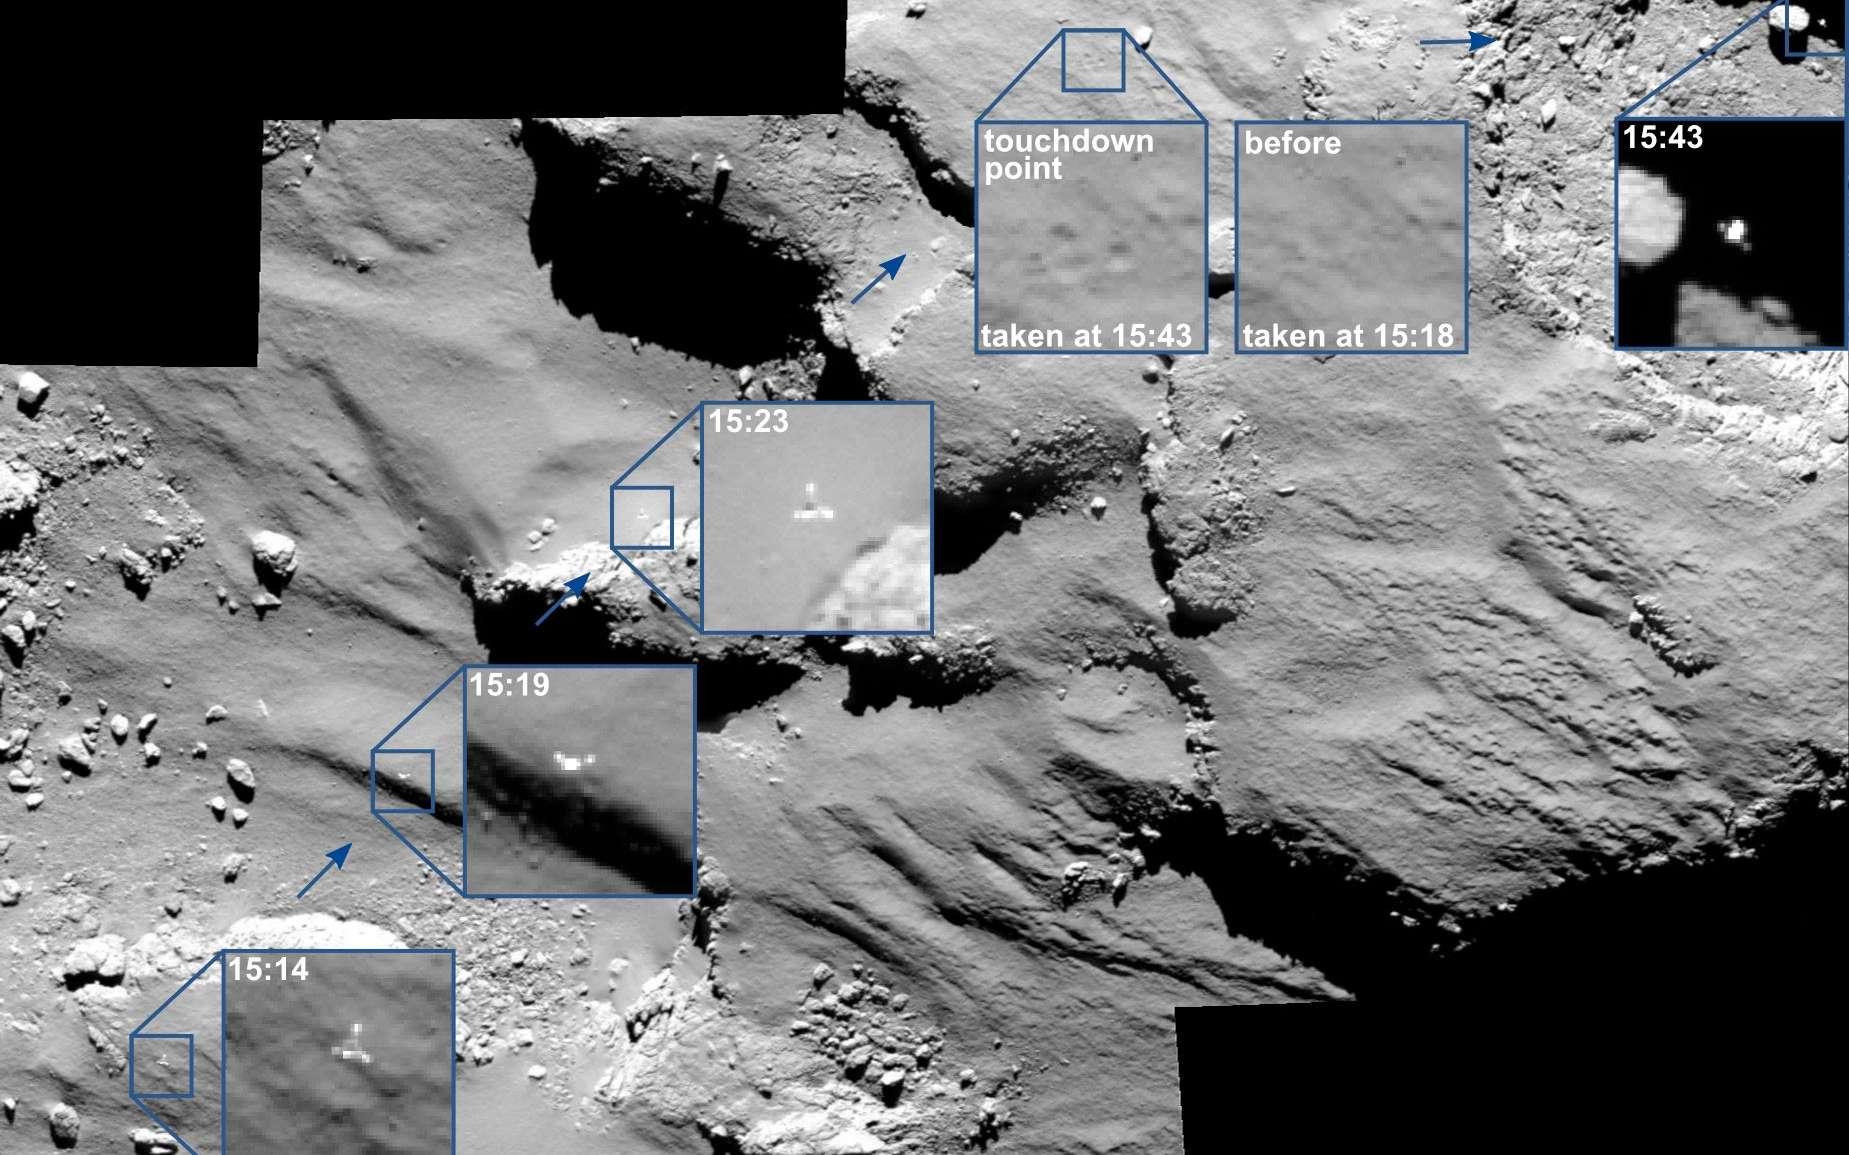 Sur la sonde Rosetta, l'instrument Osiris a suivi Philae avant et après son premier rebond sur la comète. © Esa/Rosetta/MPS for Osiris Team MPS/UPD/LAM/IAA/SSO/INTA/UPM/DASP/IDA